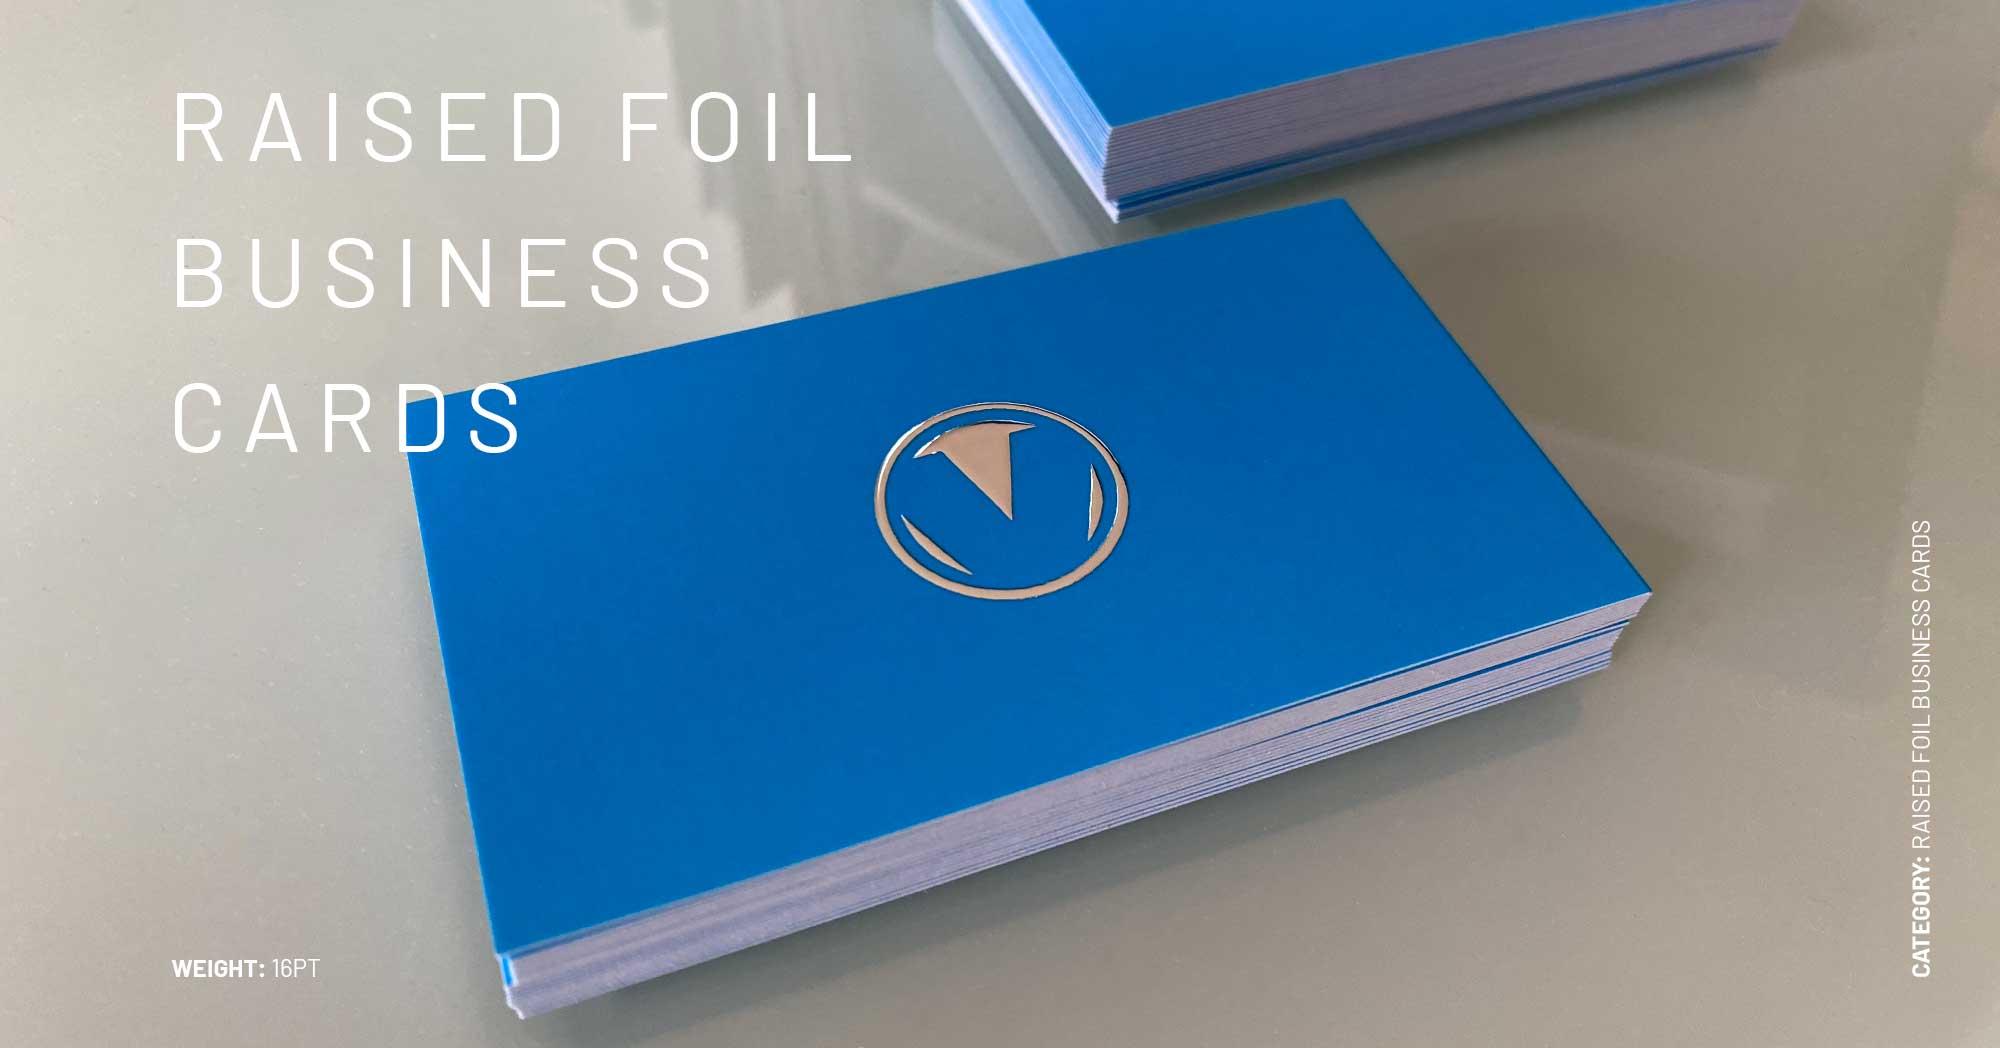 Raised Foil Cards